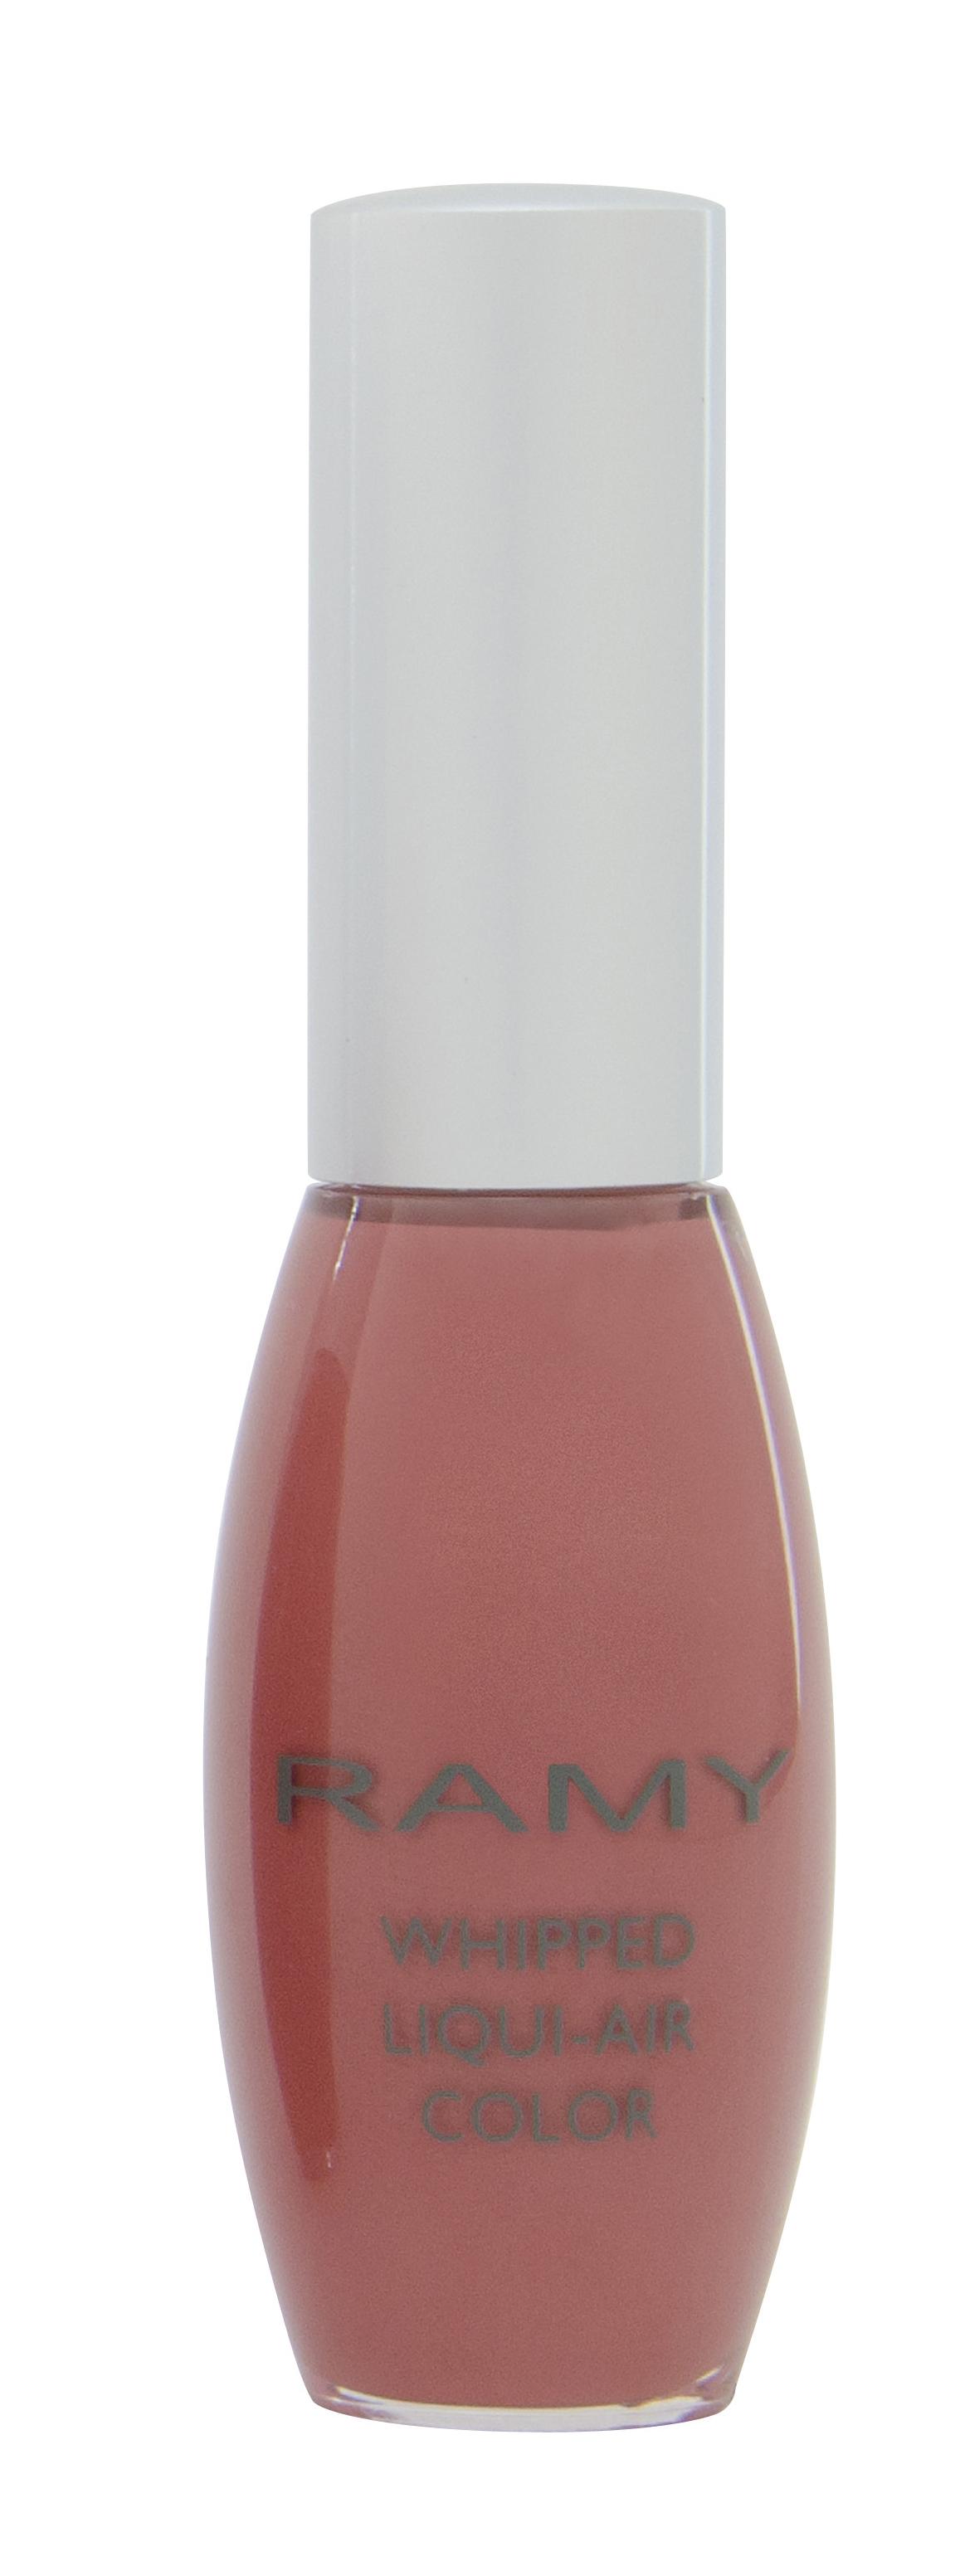 ramy-cosmeticspink-champagnethumb.jpg